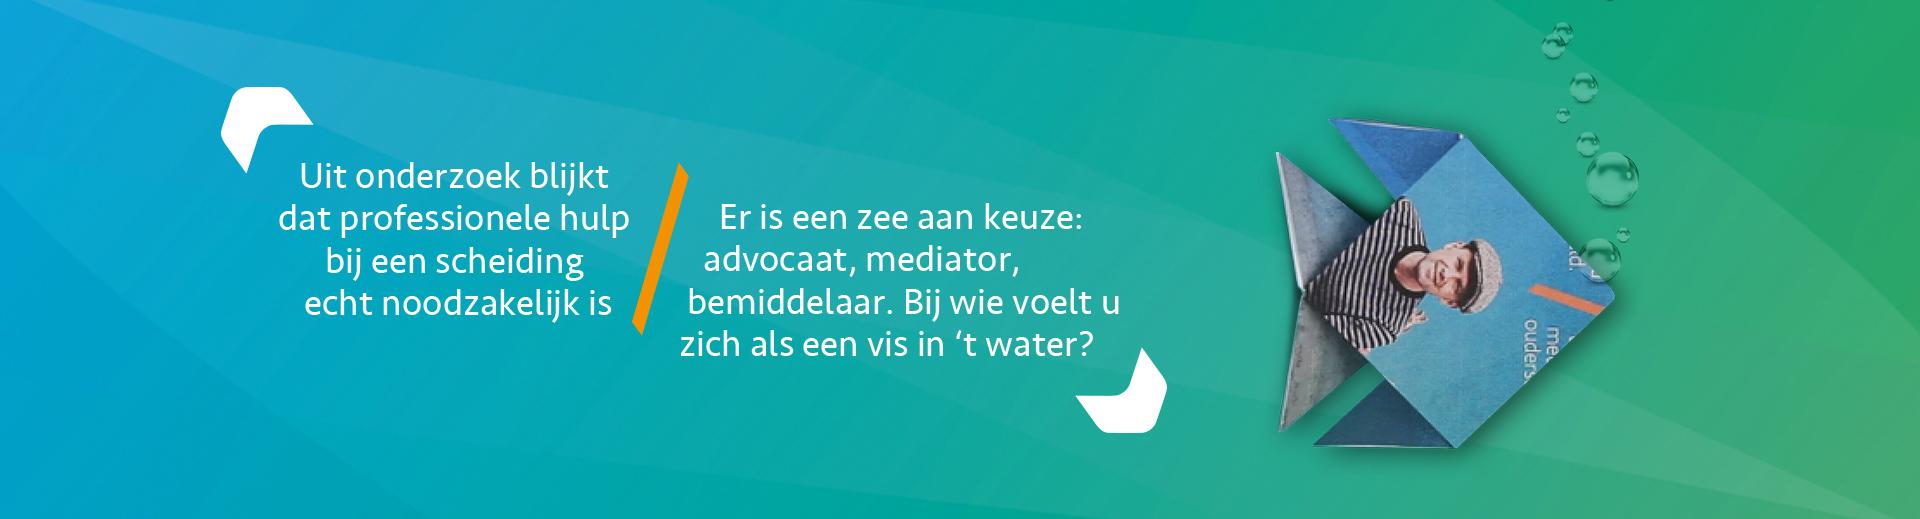 Hoe kan ik de scheiding regelen - Scheidingsplanner Hilversum | Bilthoven | Soest | 't Gooi